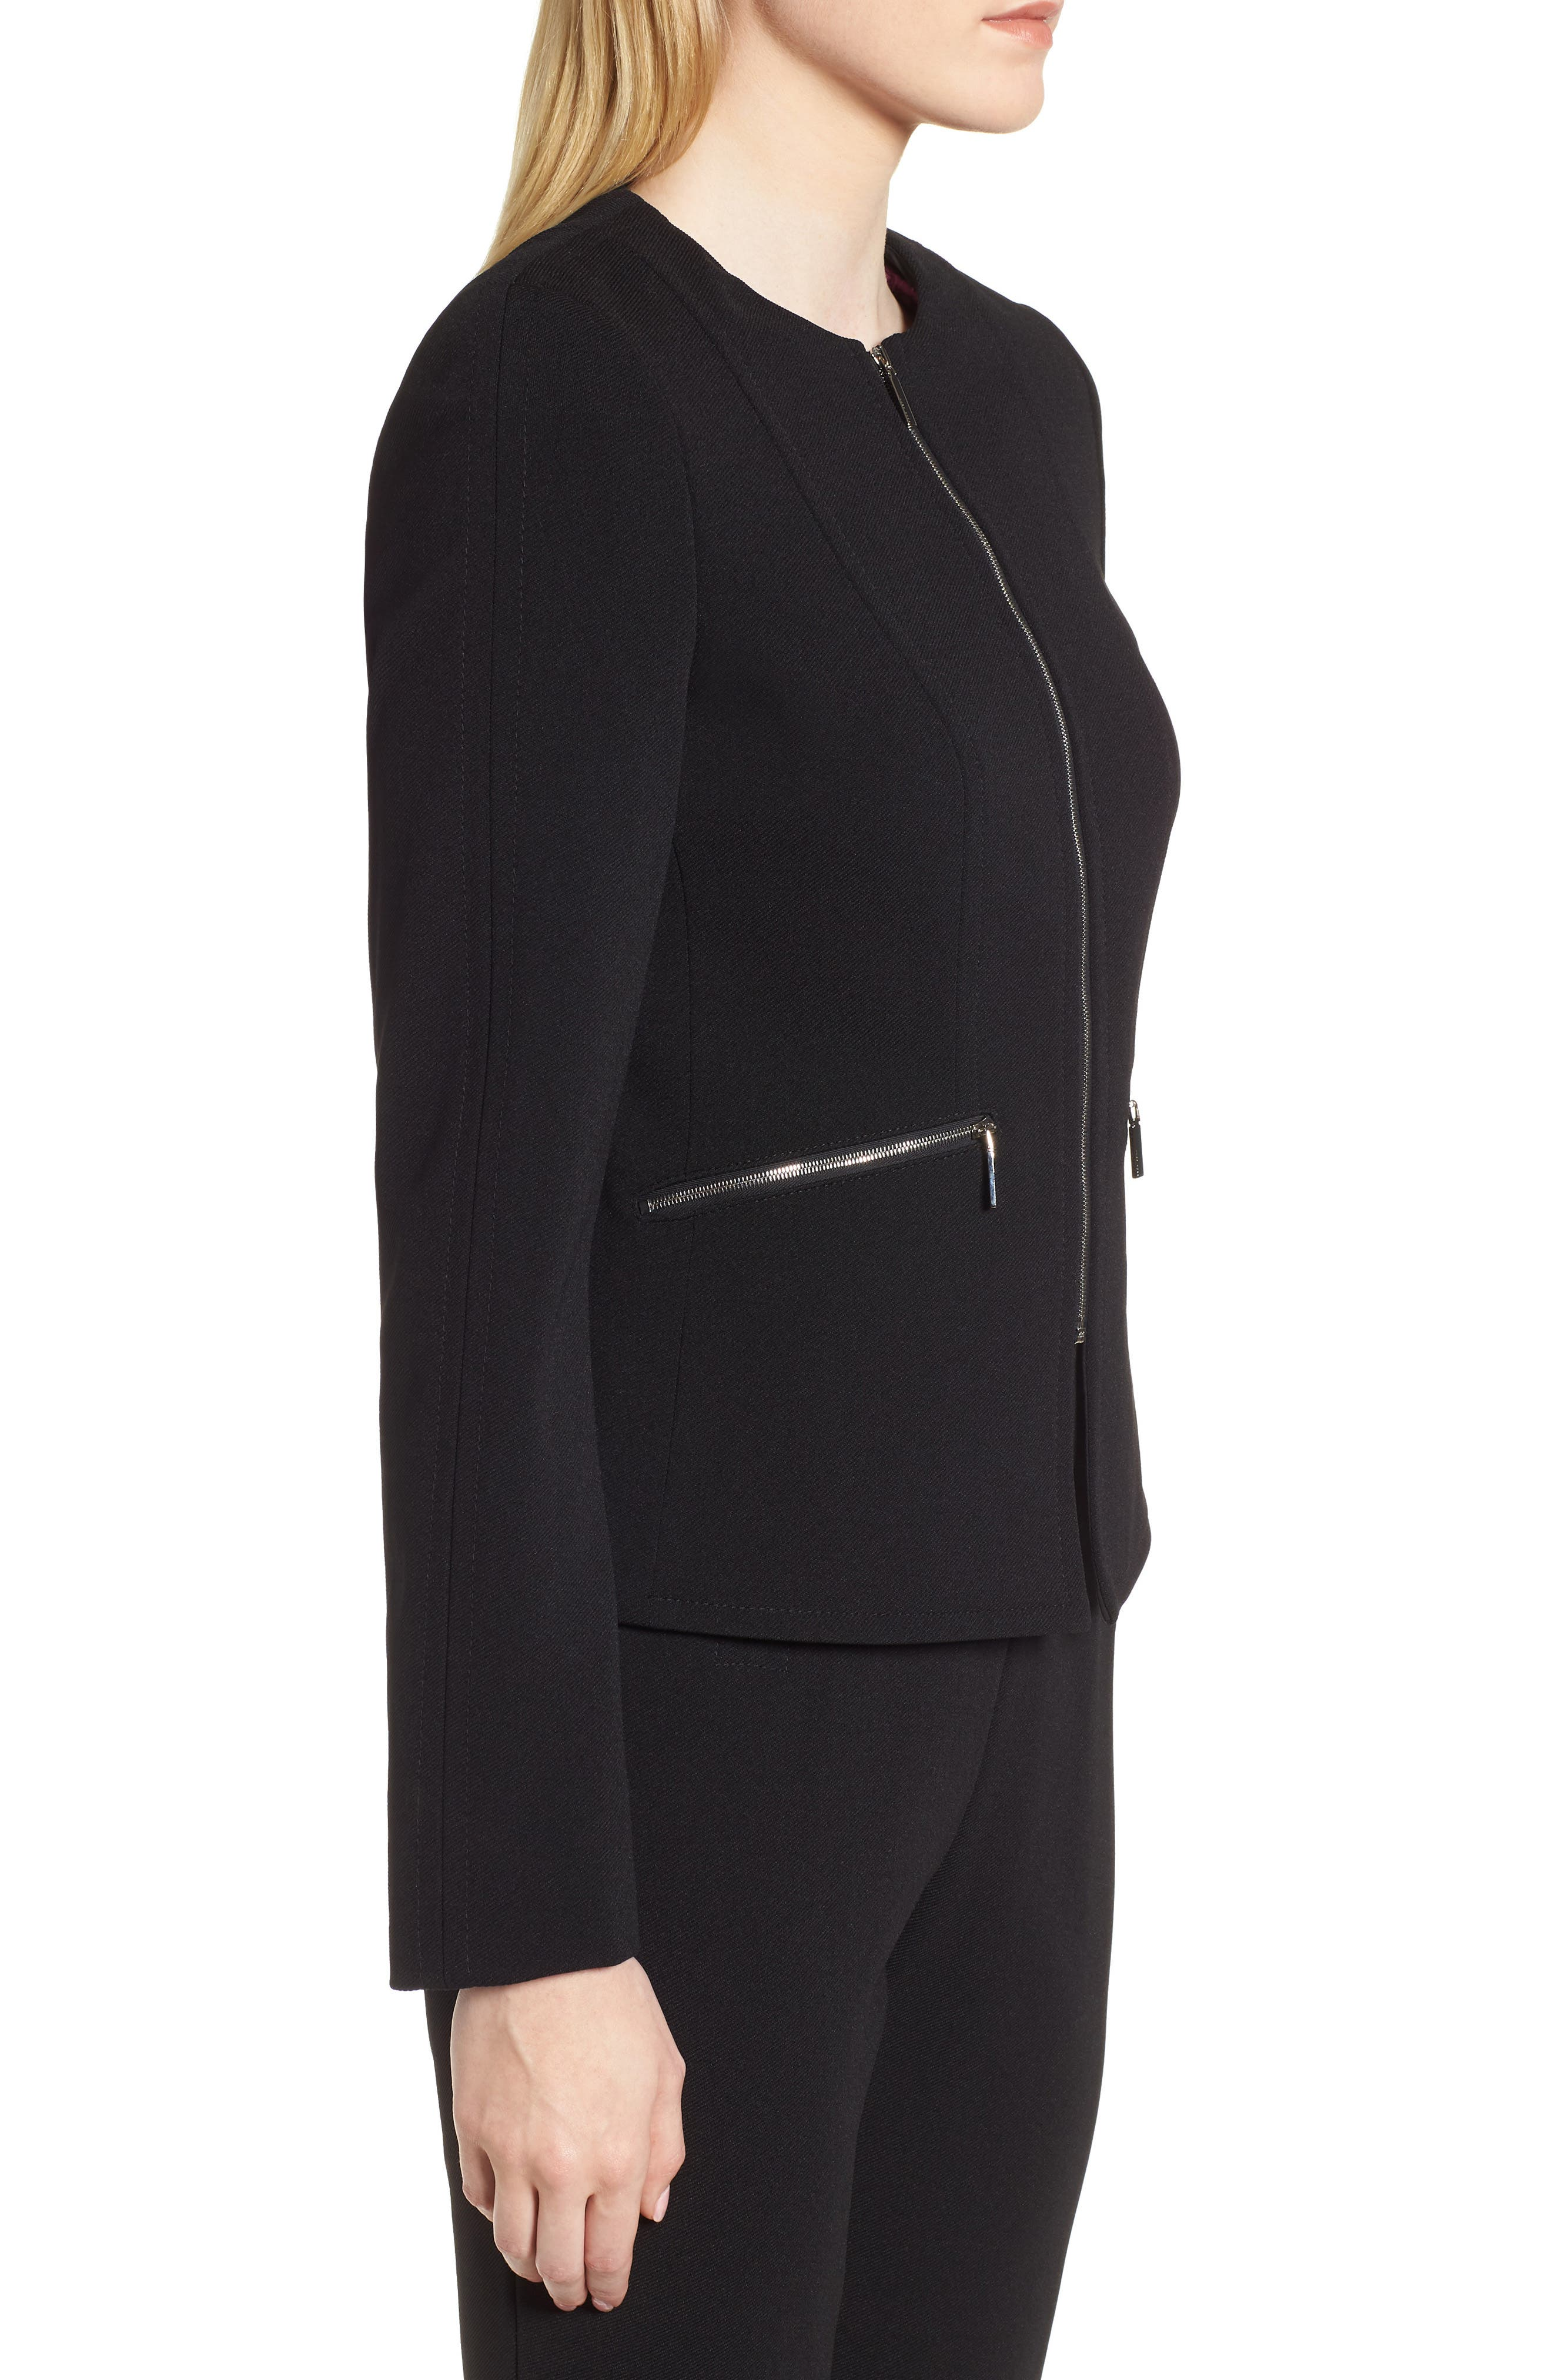 Jazulara Twill Jersey Suit Jacket,                             Alternate thumbnail 3, color,                             001